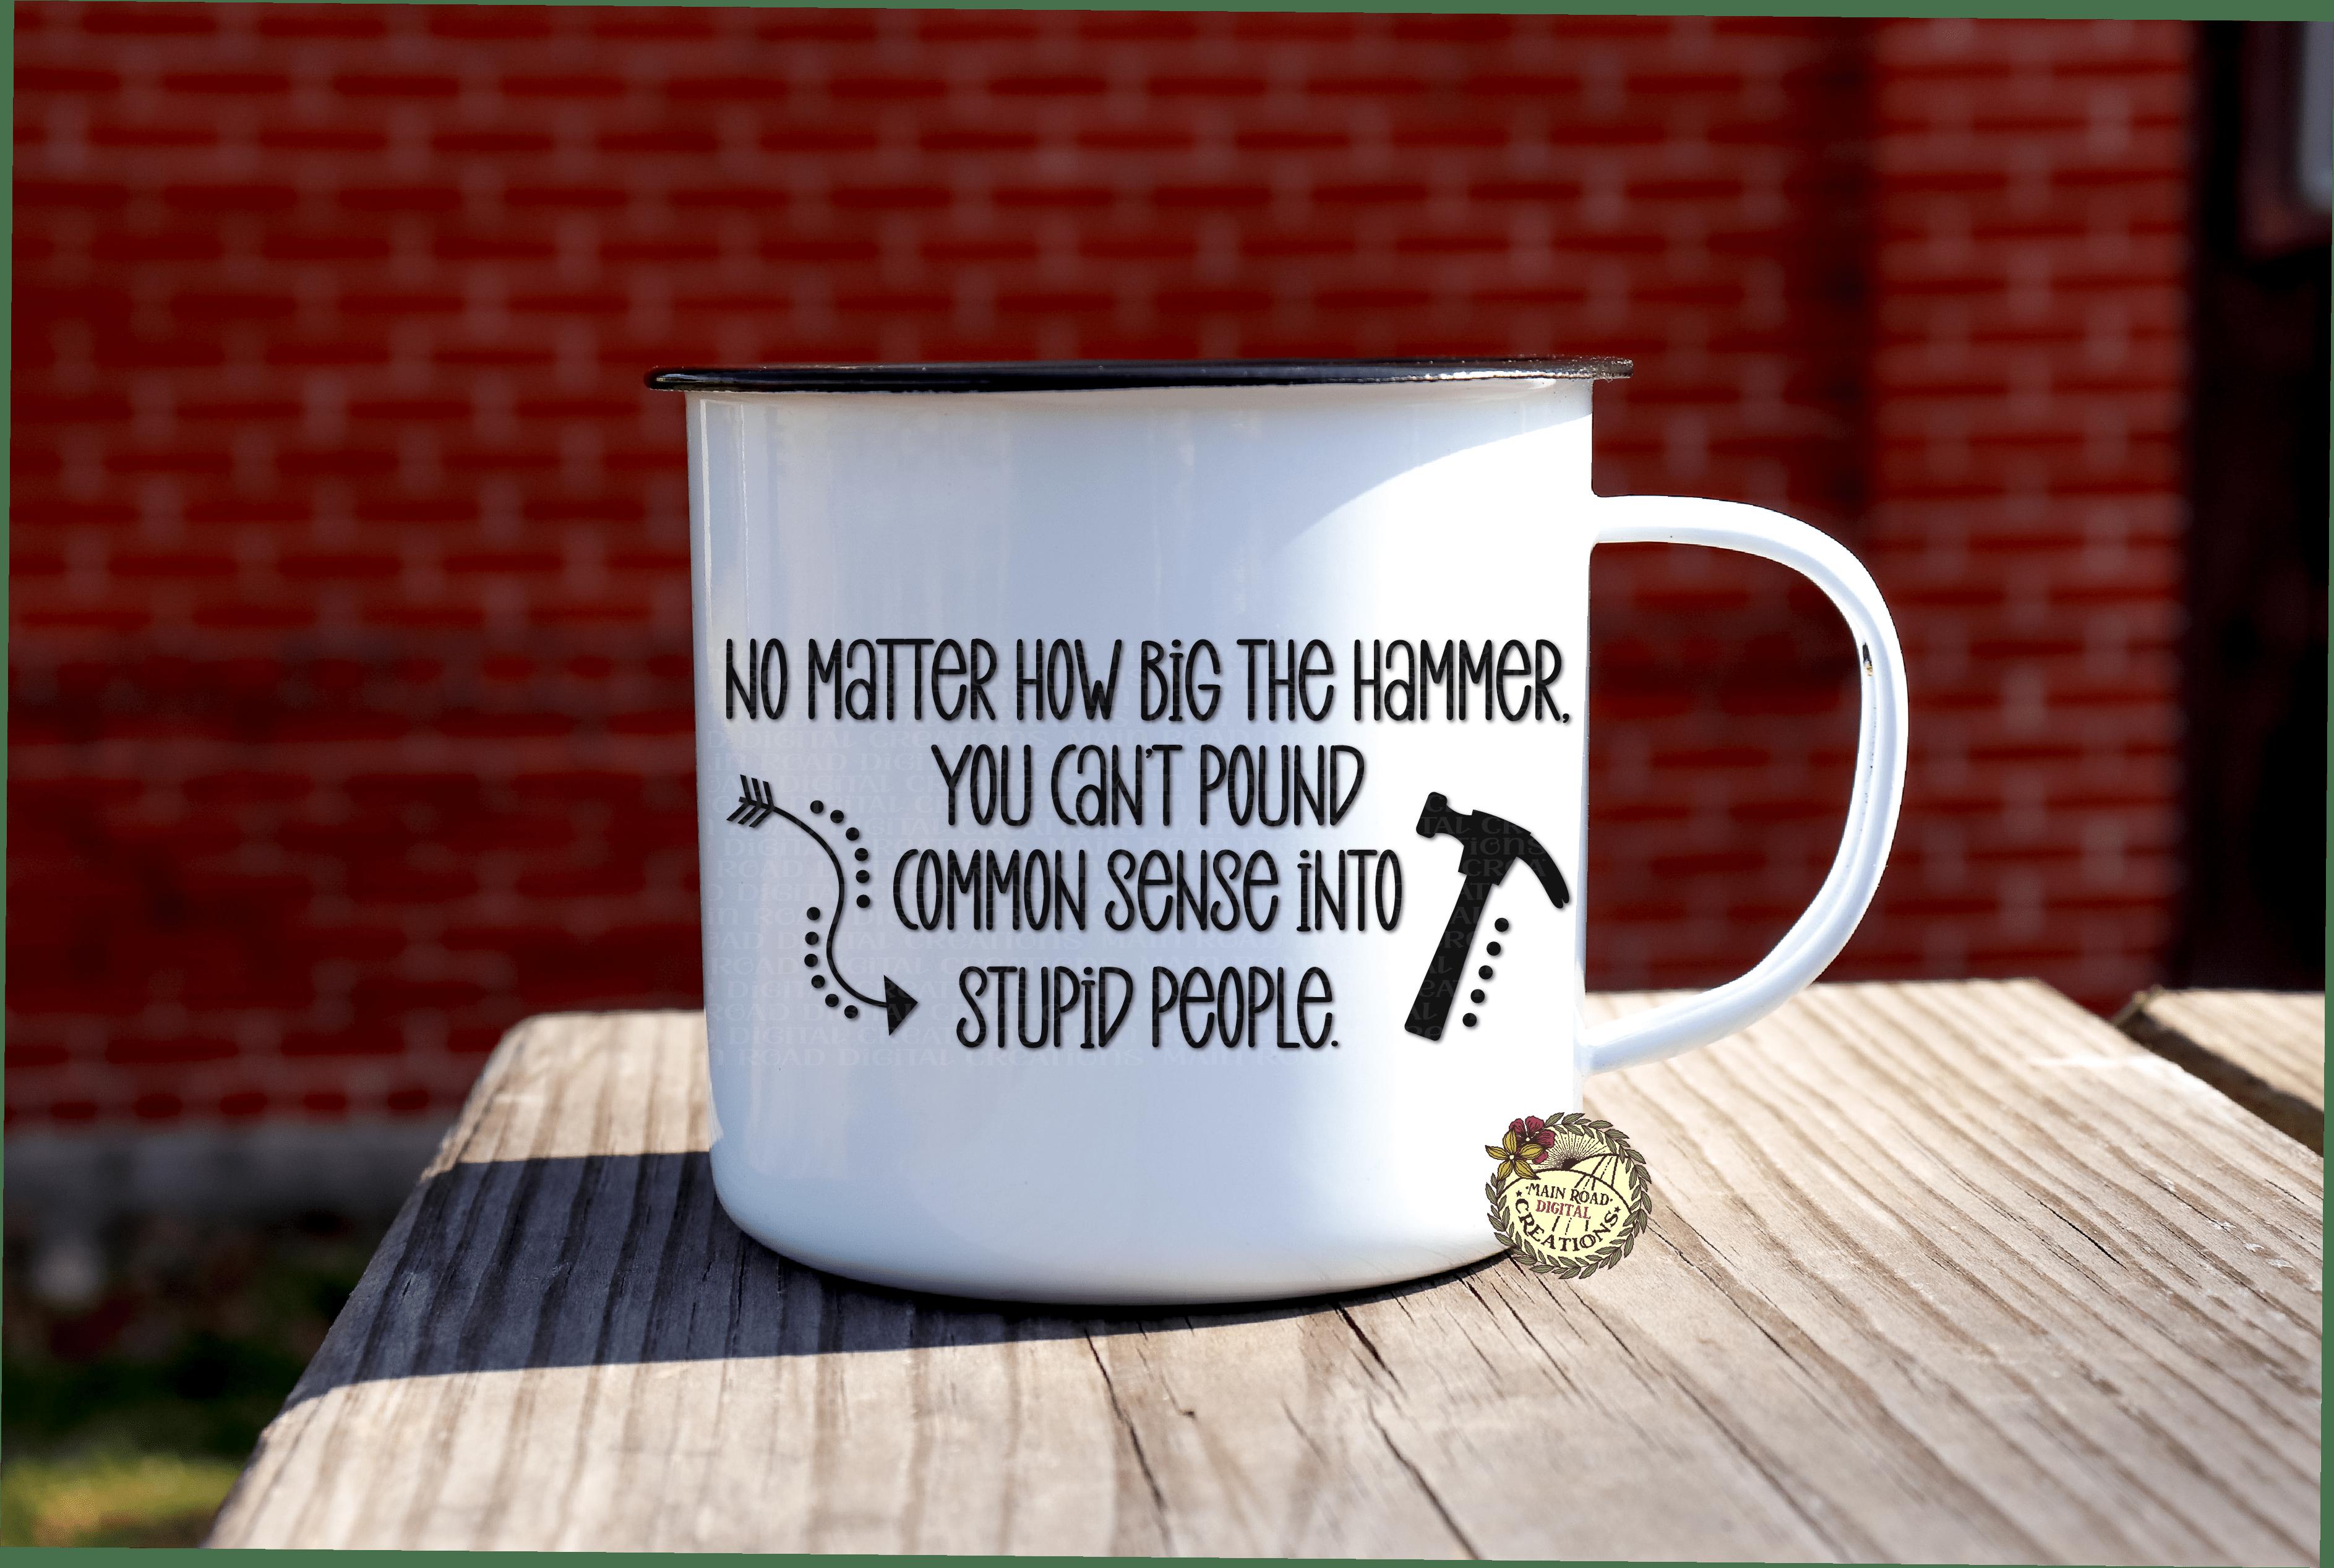 funny common sense svg, free common sense svg, free common file,   free funny svg, sublimation freebies, funny common sense file on mug, free mug svg design